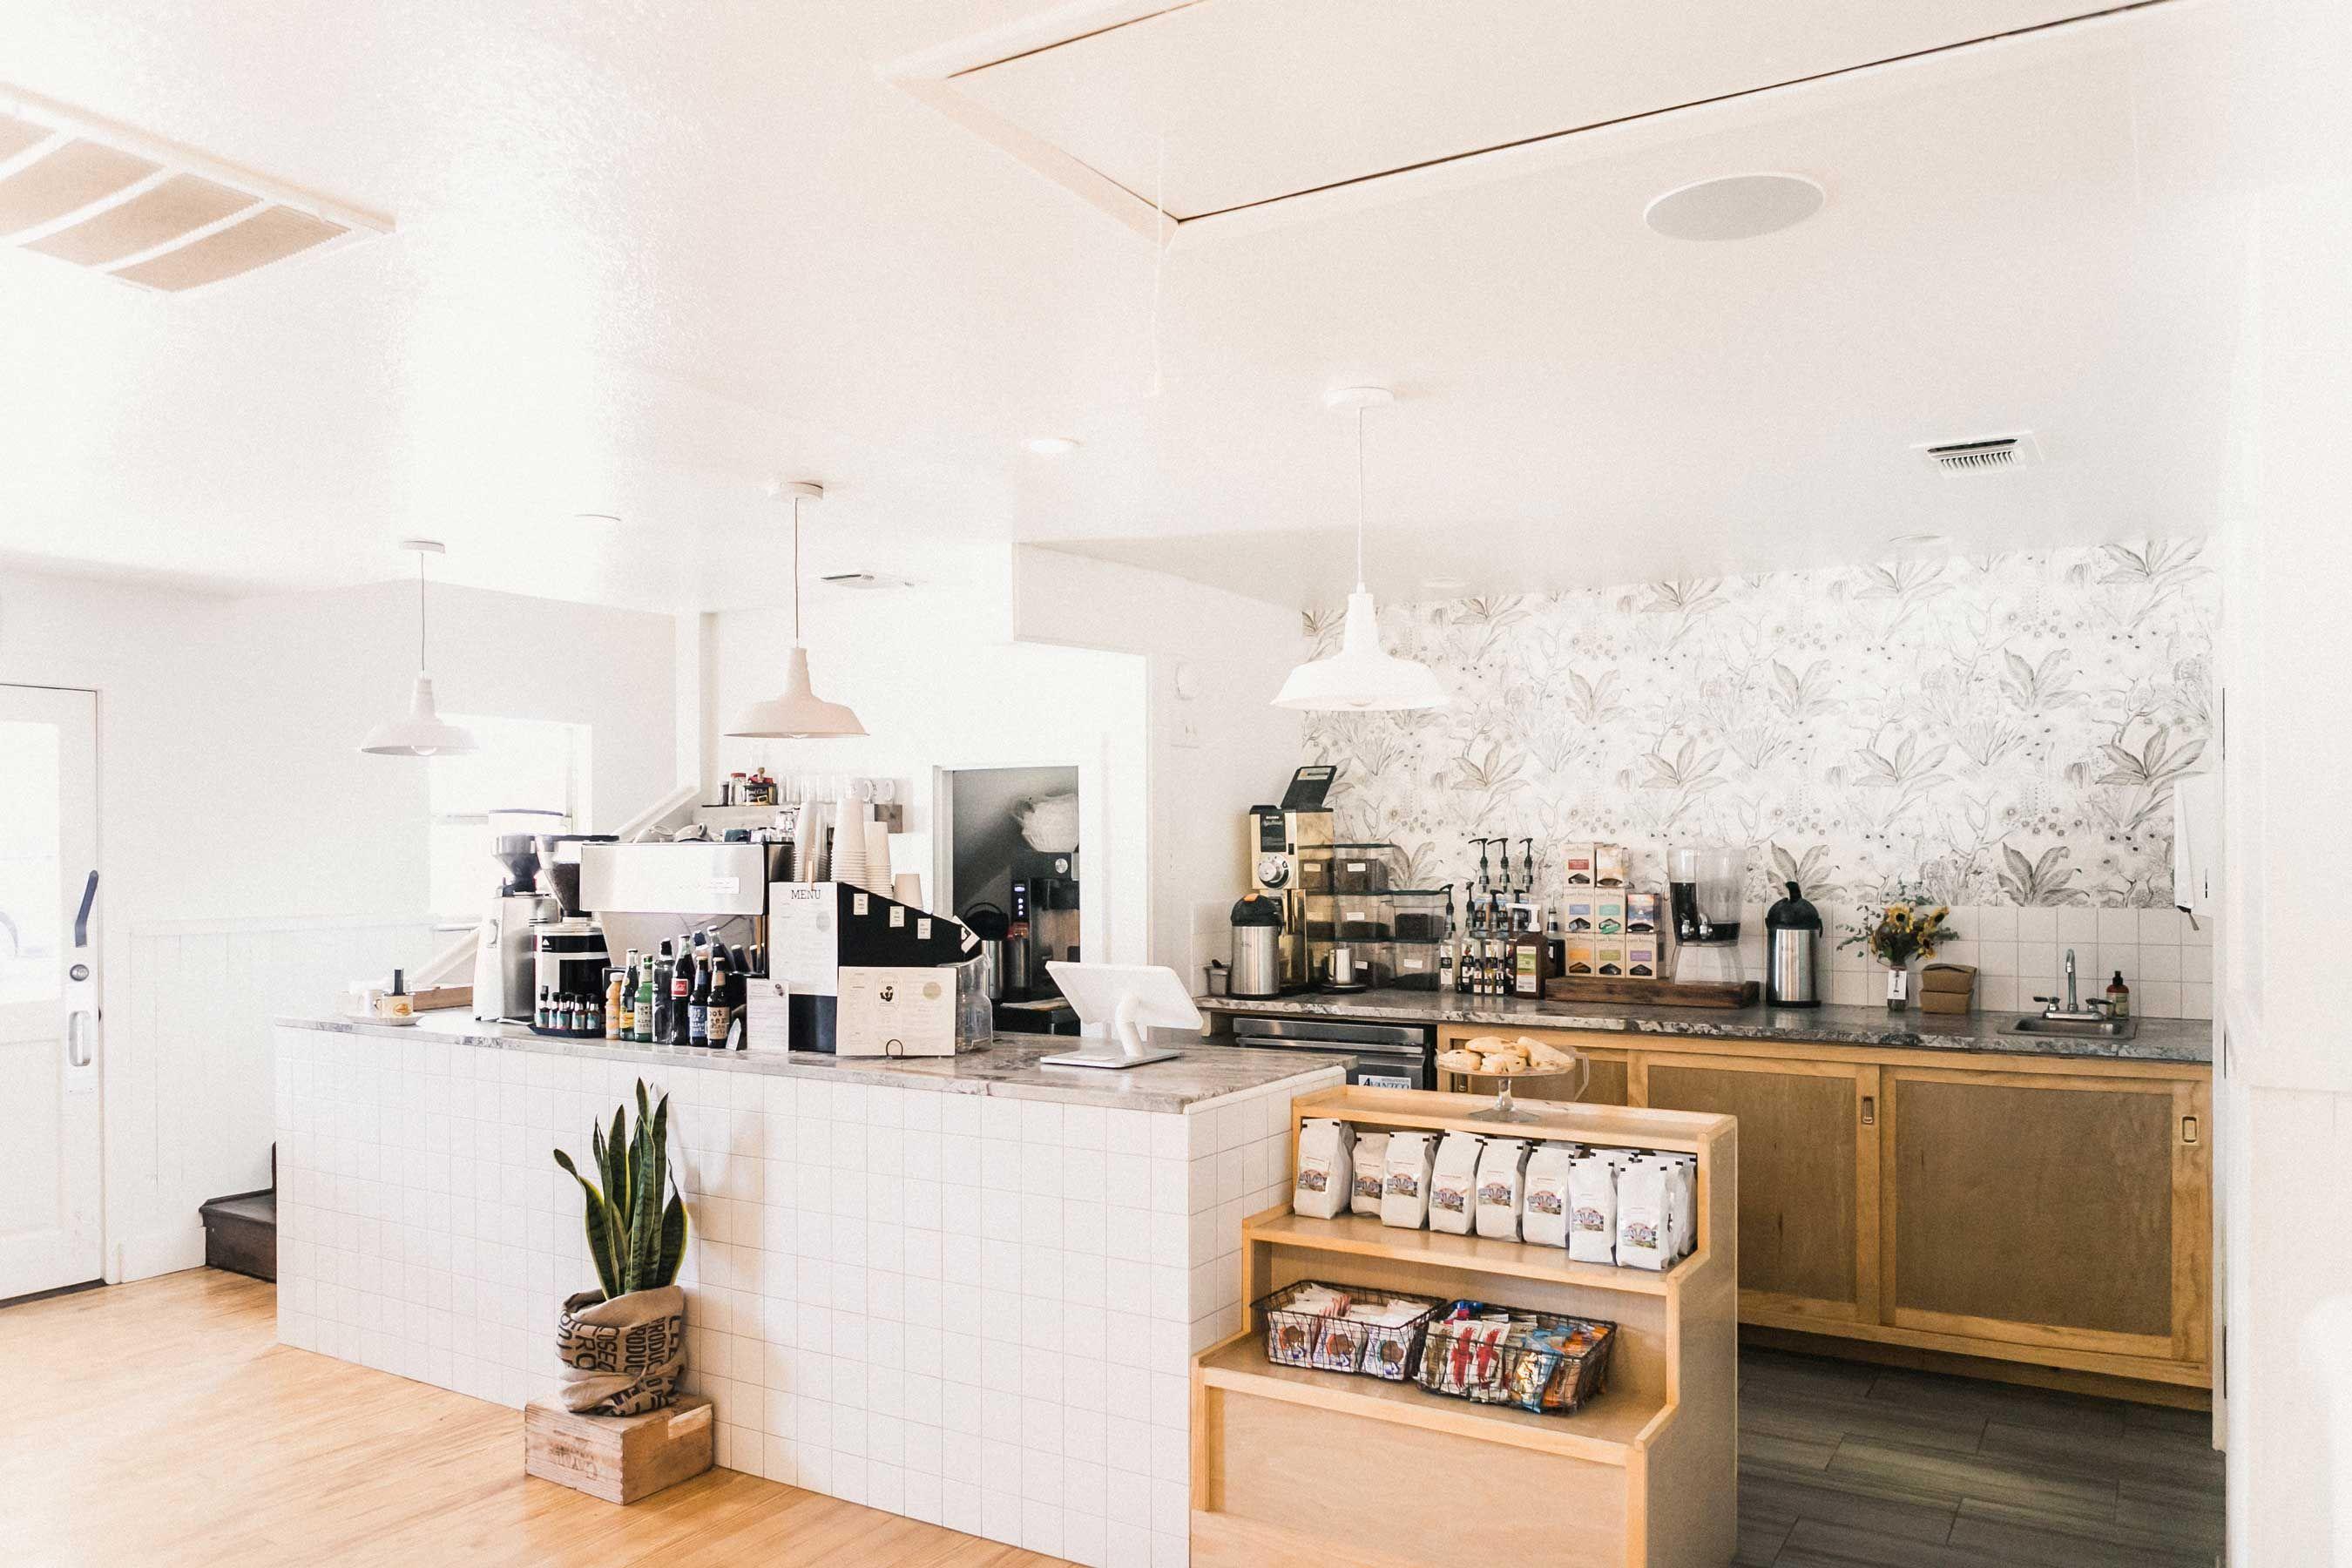 Coffee Shop & Brunch Cafe in Fredericksburg, Texas